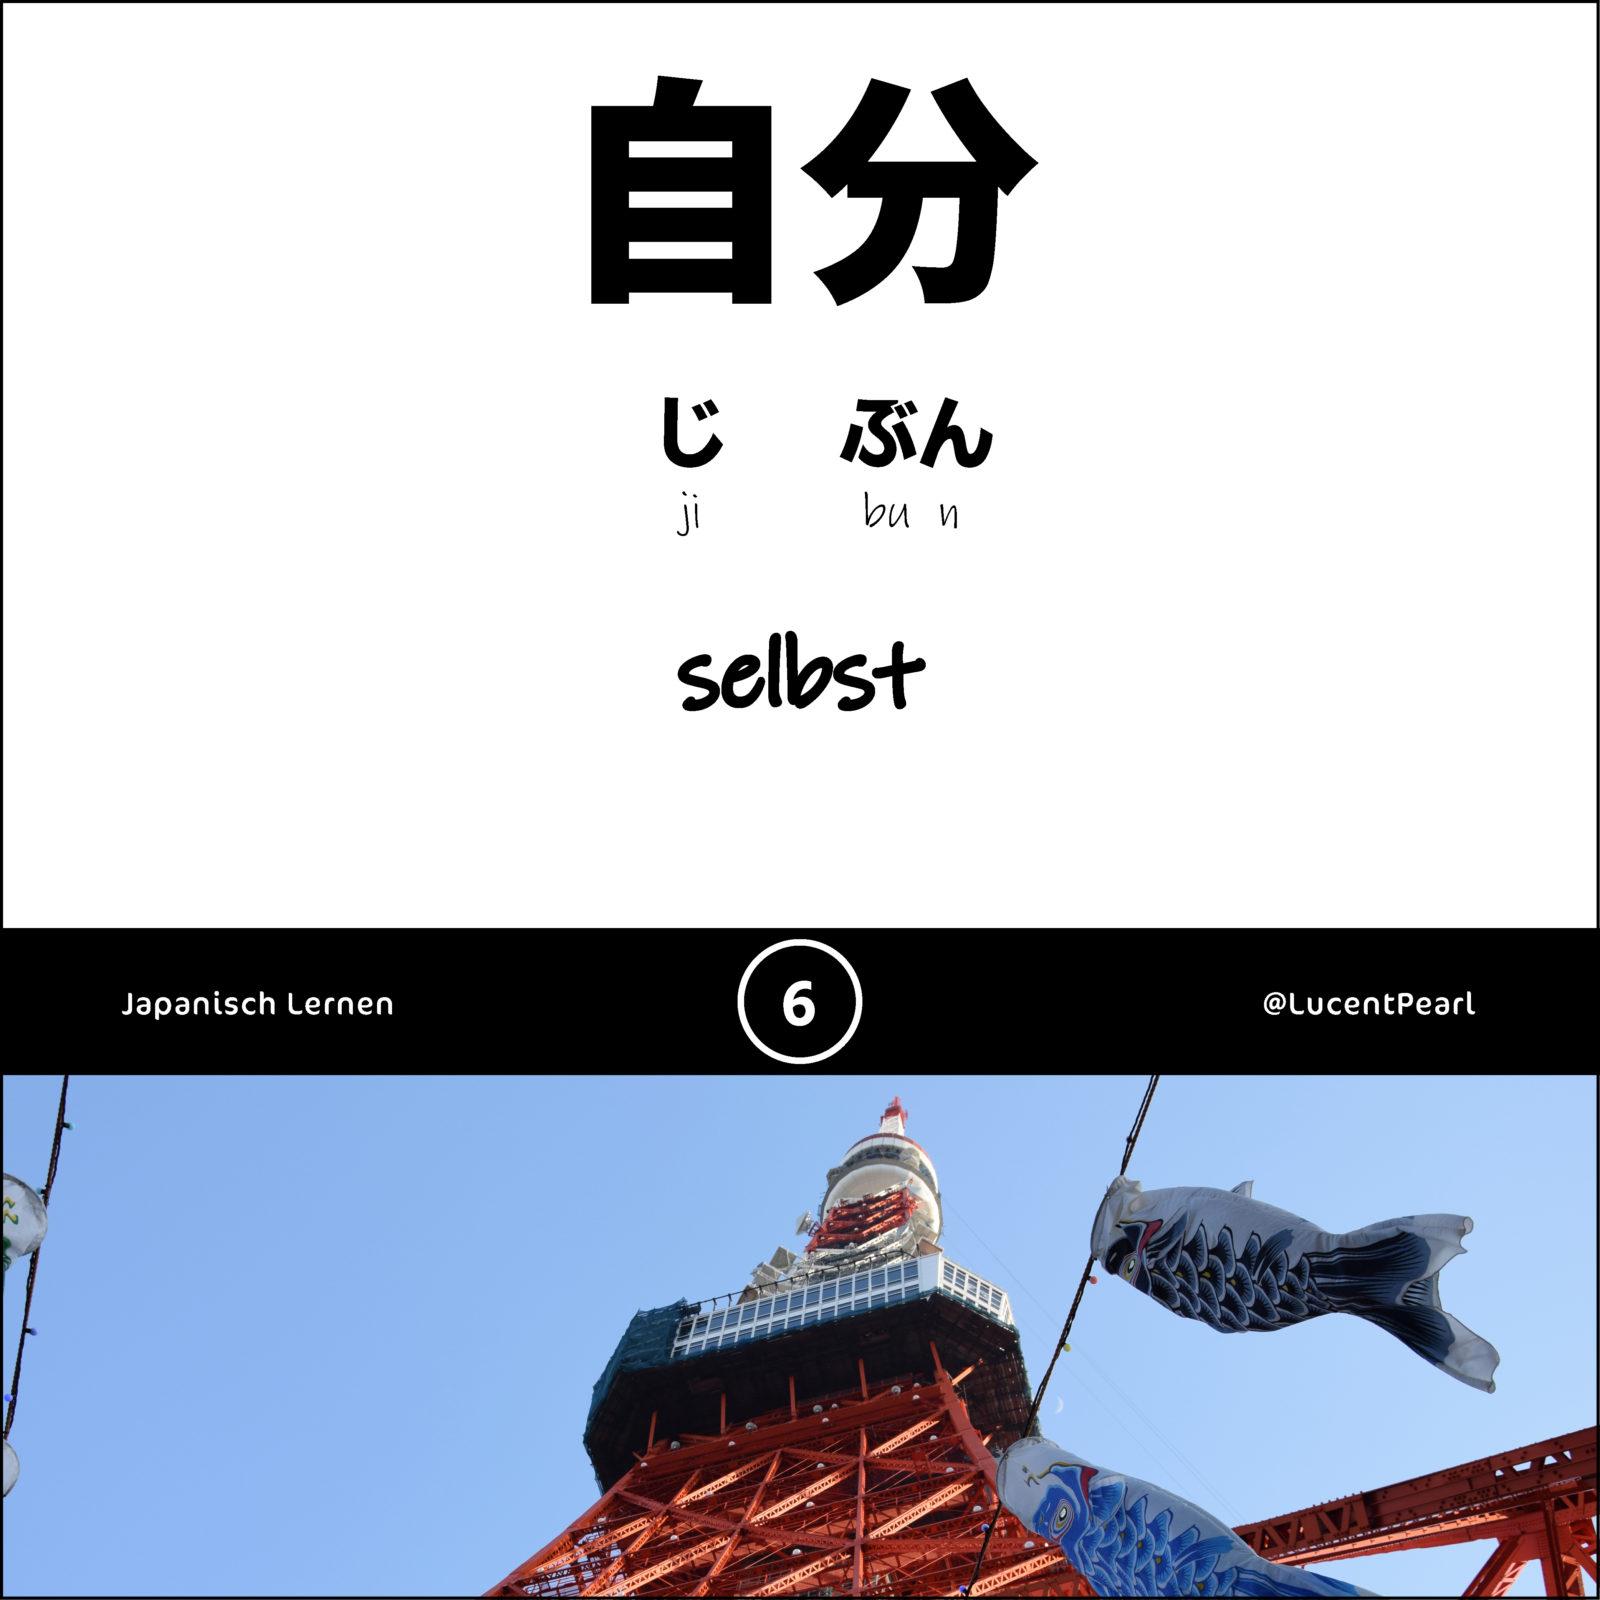 Japanisch selbst jibun